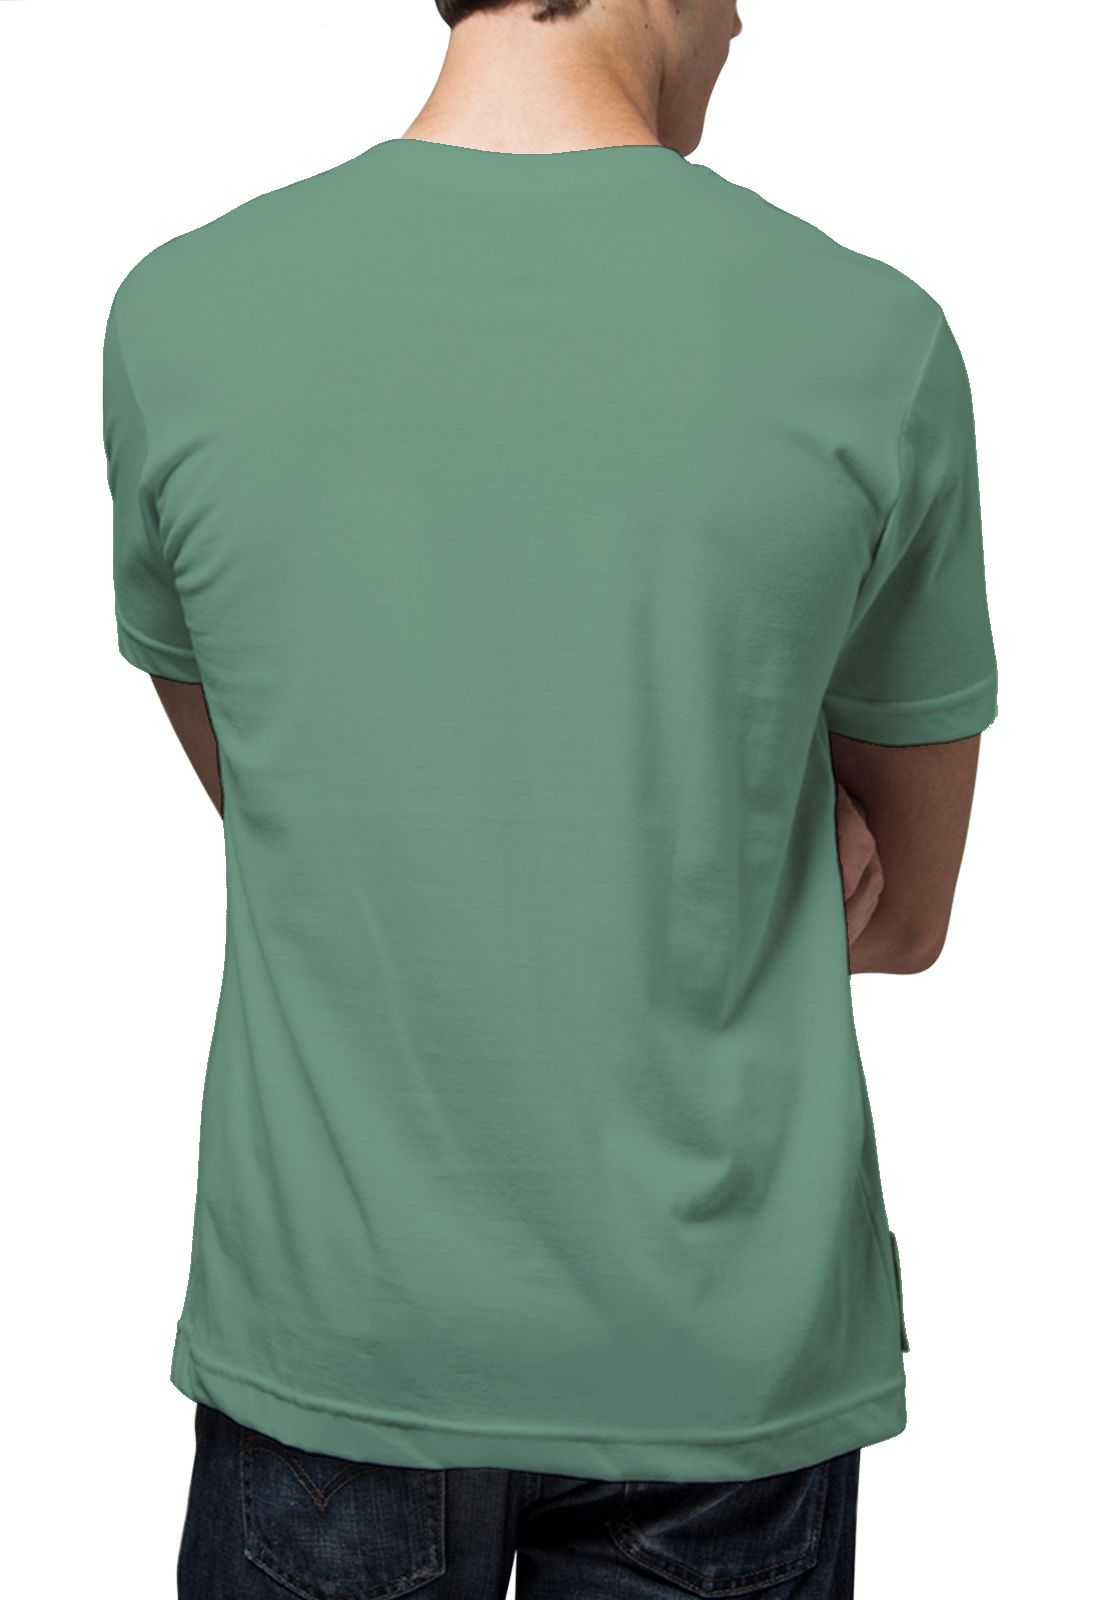 Camiseta Amazônia Biomas - Verde